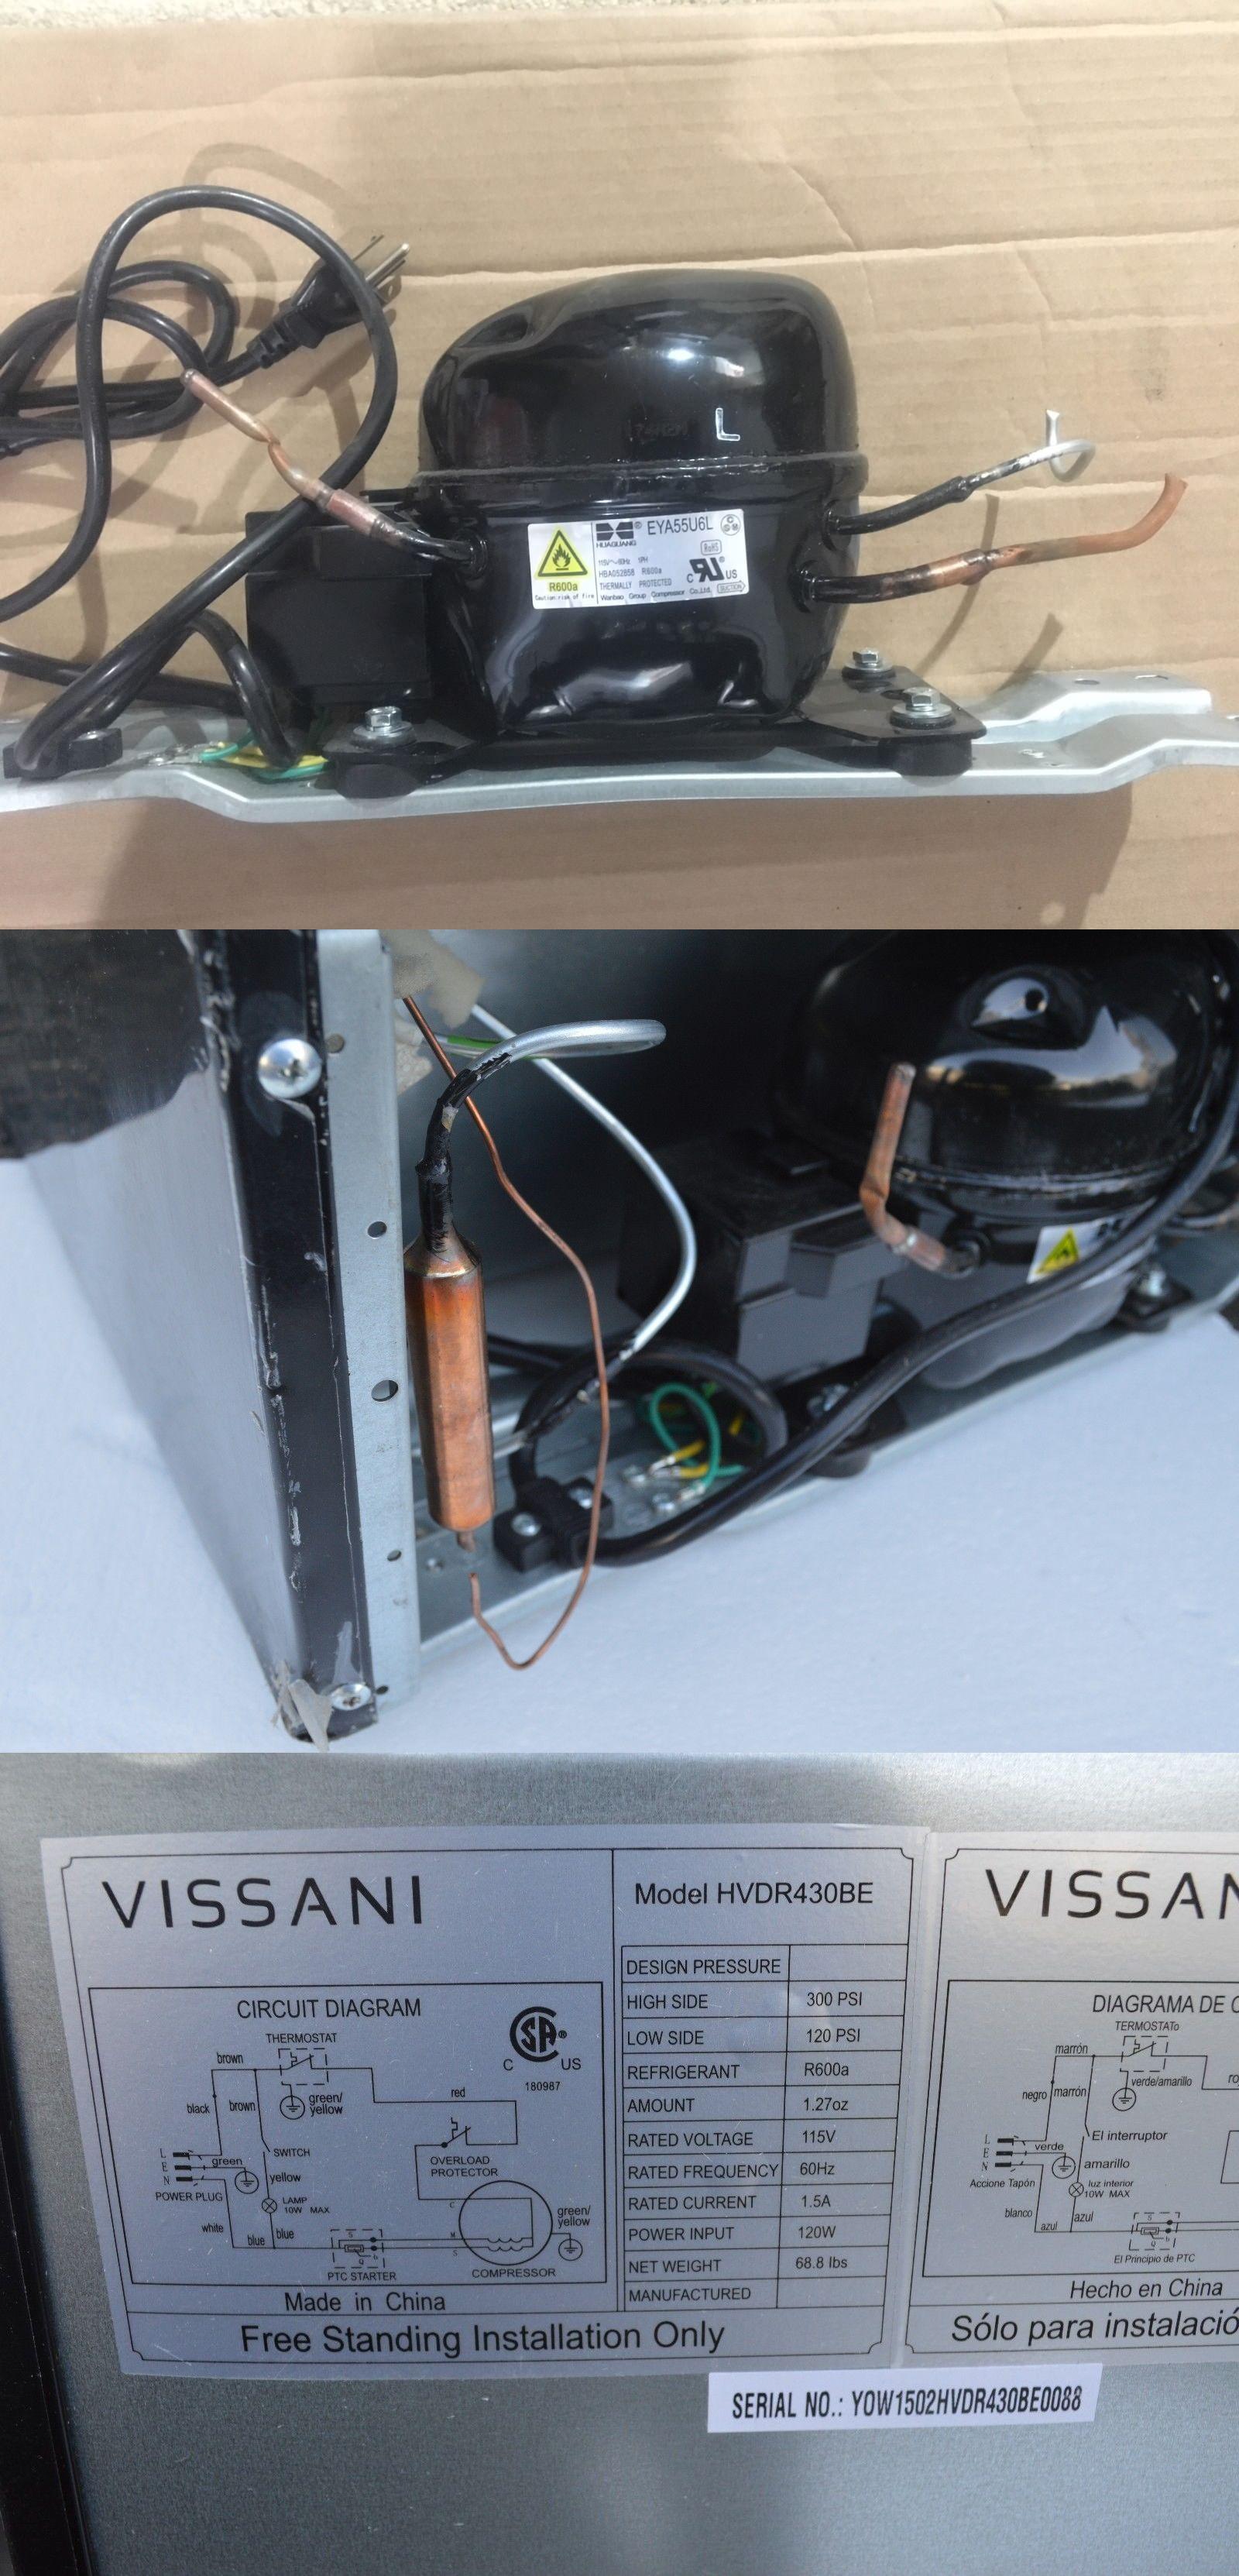 Mini Fridges 71262: Compressor Motor For Vissani Hvdr430be 4.3 Cu. Ft. Mini  Refrigerator -> BUY IT NOW ONLY: $50 on #eBay #fridges… | Mini fridges, Mini,  CompressorPinterest